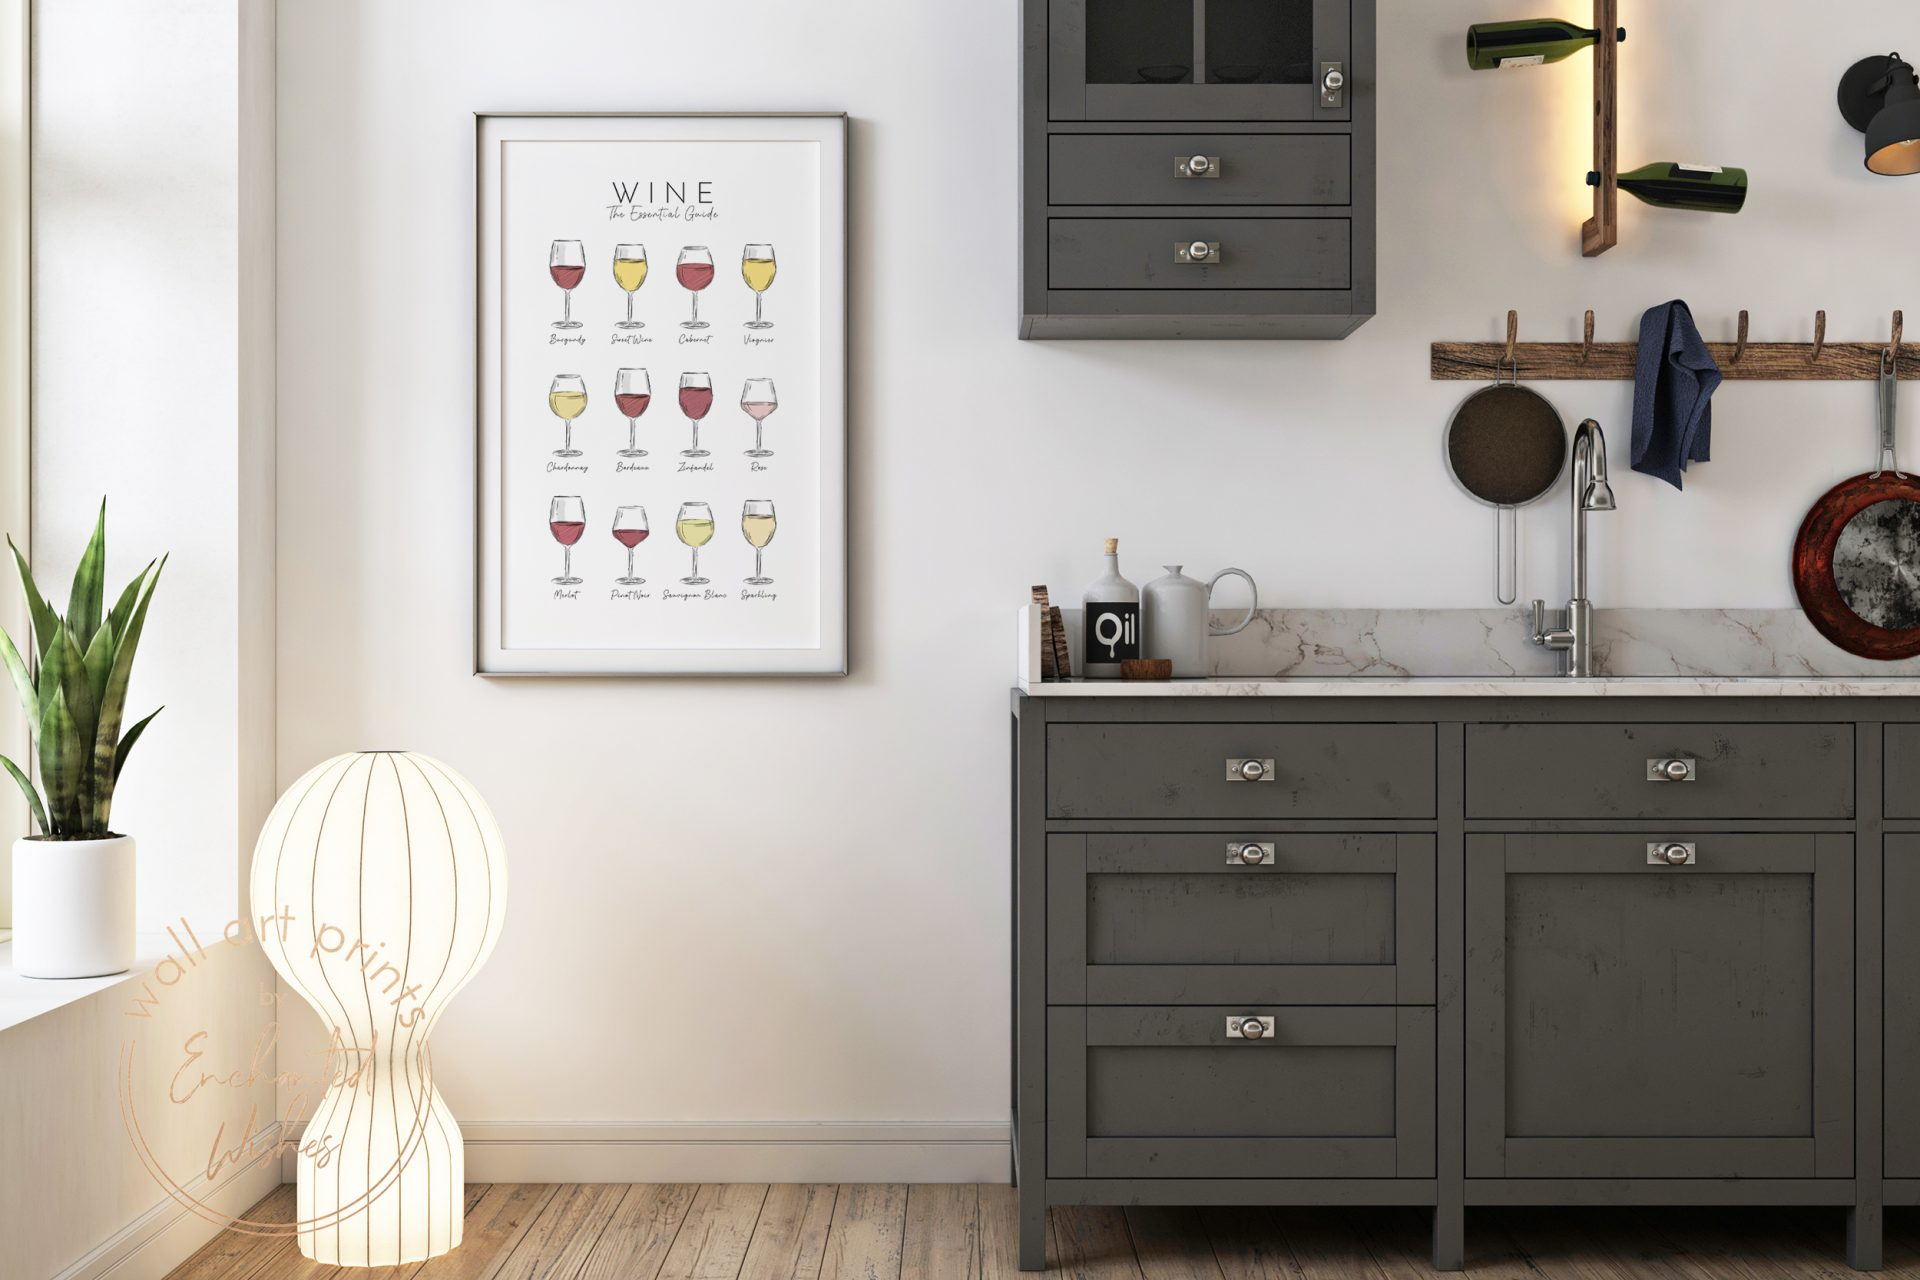 Wine guide print